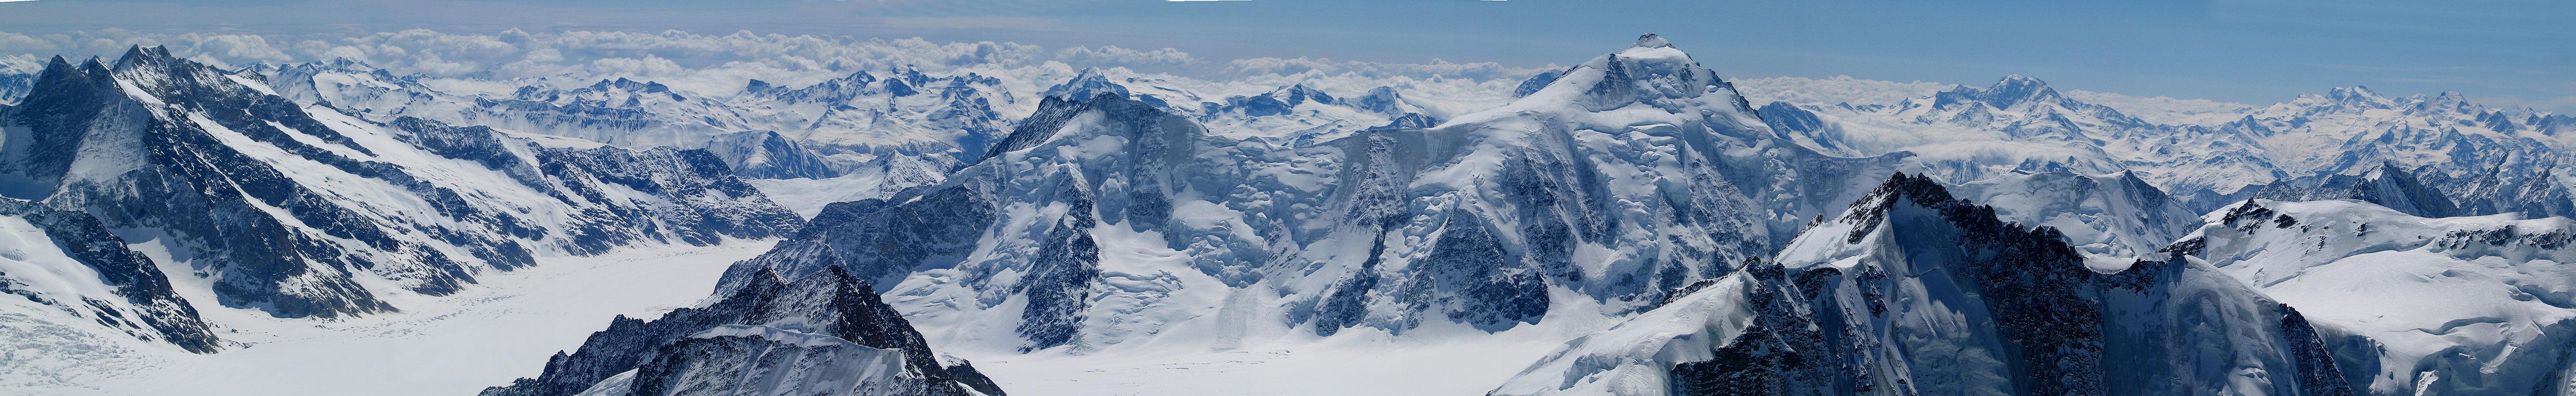 Jungfrau Berner Alpen / Alpes bernoises Schweiz panorama 07